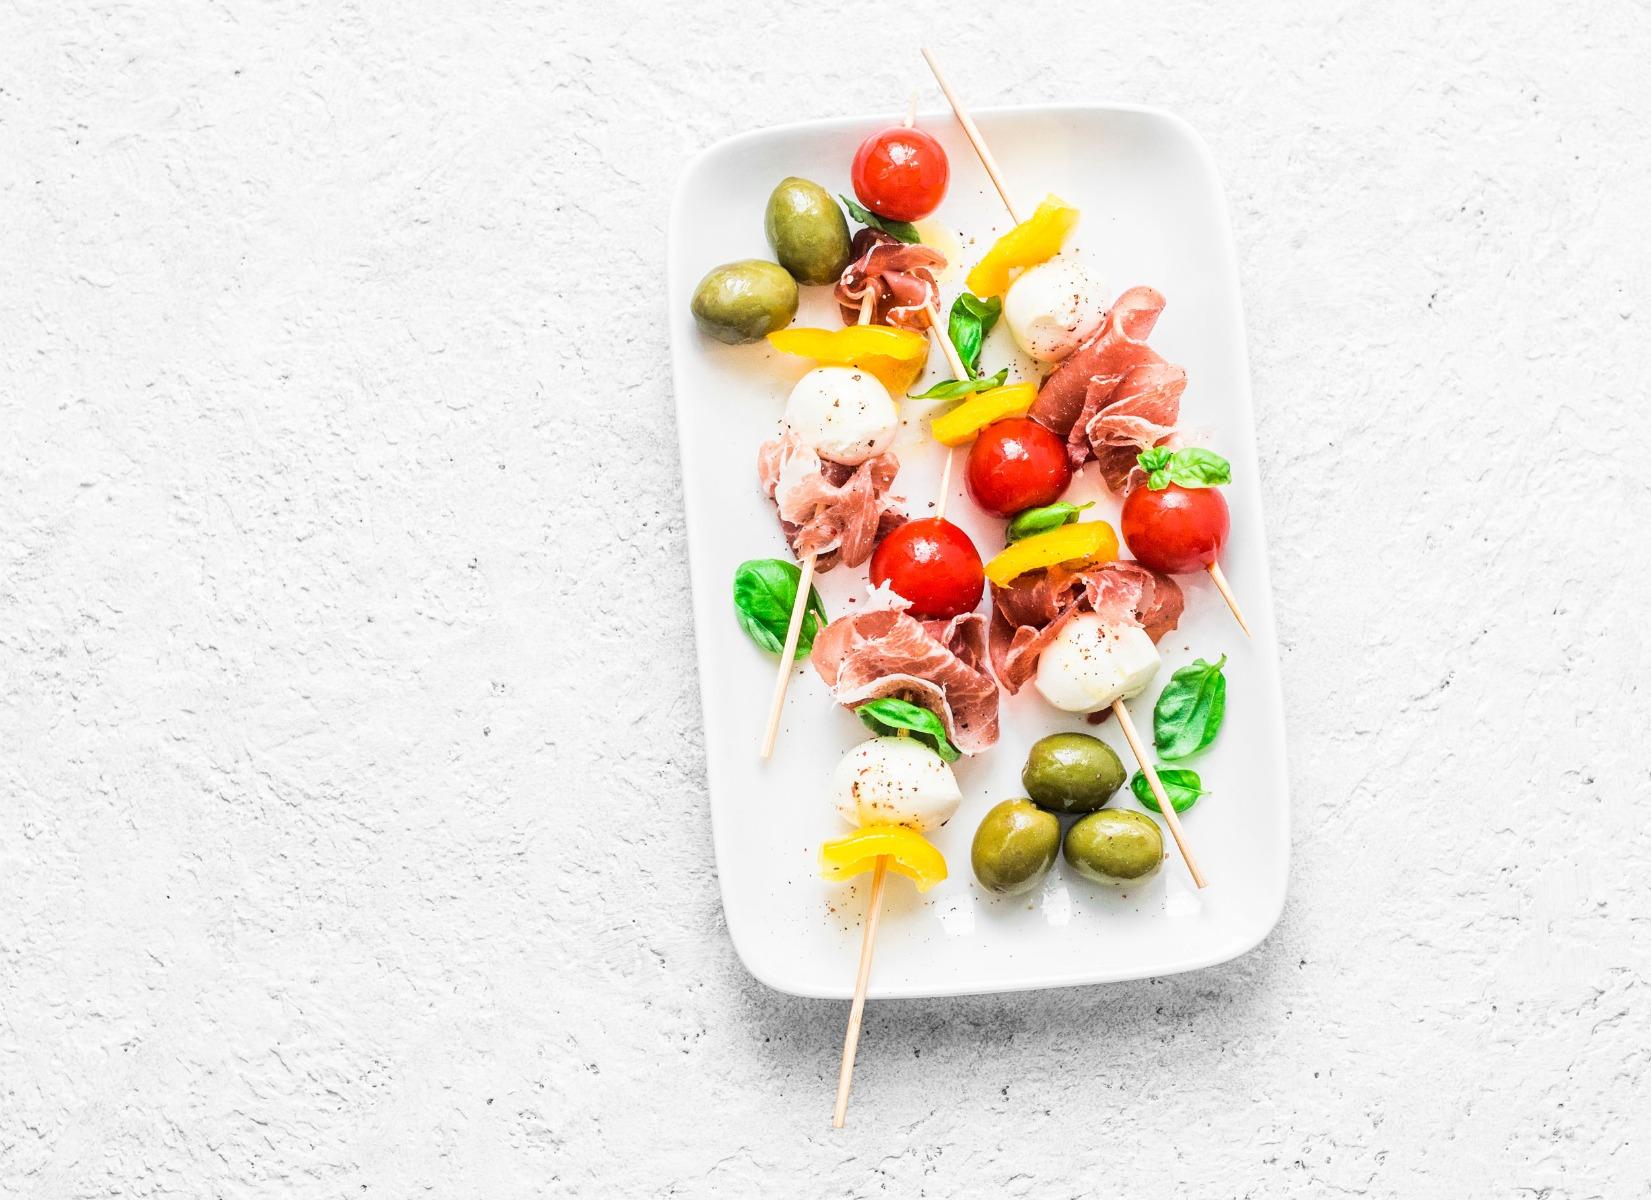 PrikenTik wijnstreken - Foodpairing - Picknick2